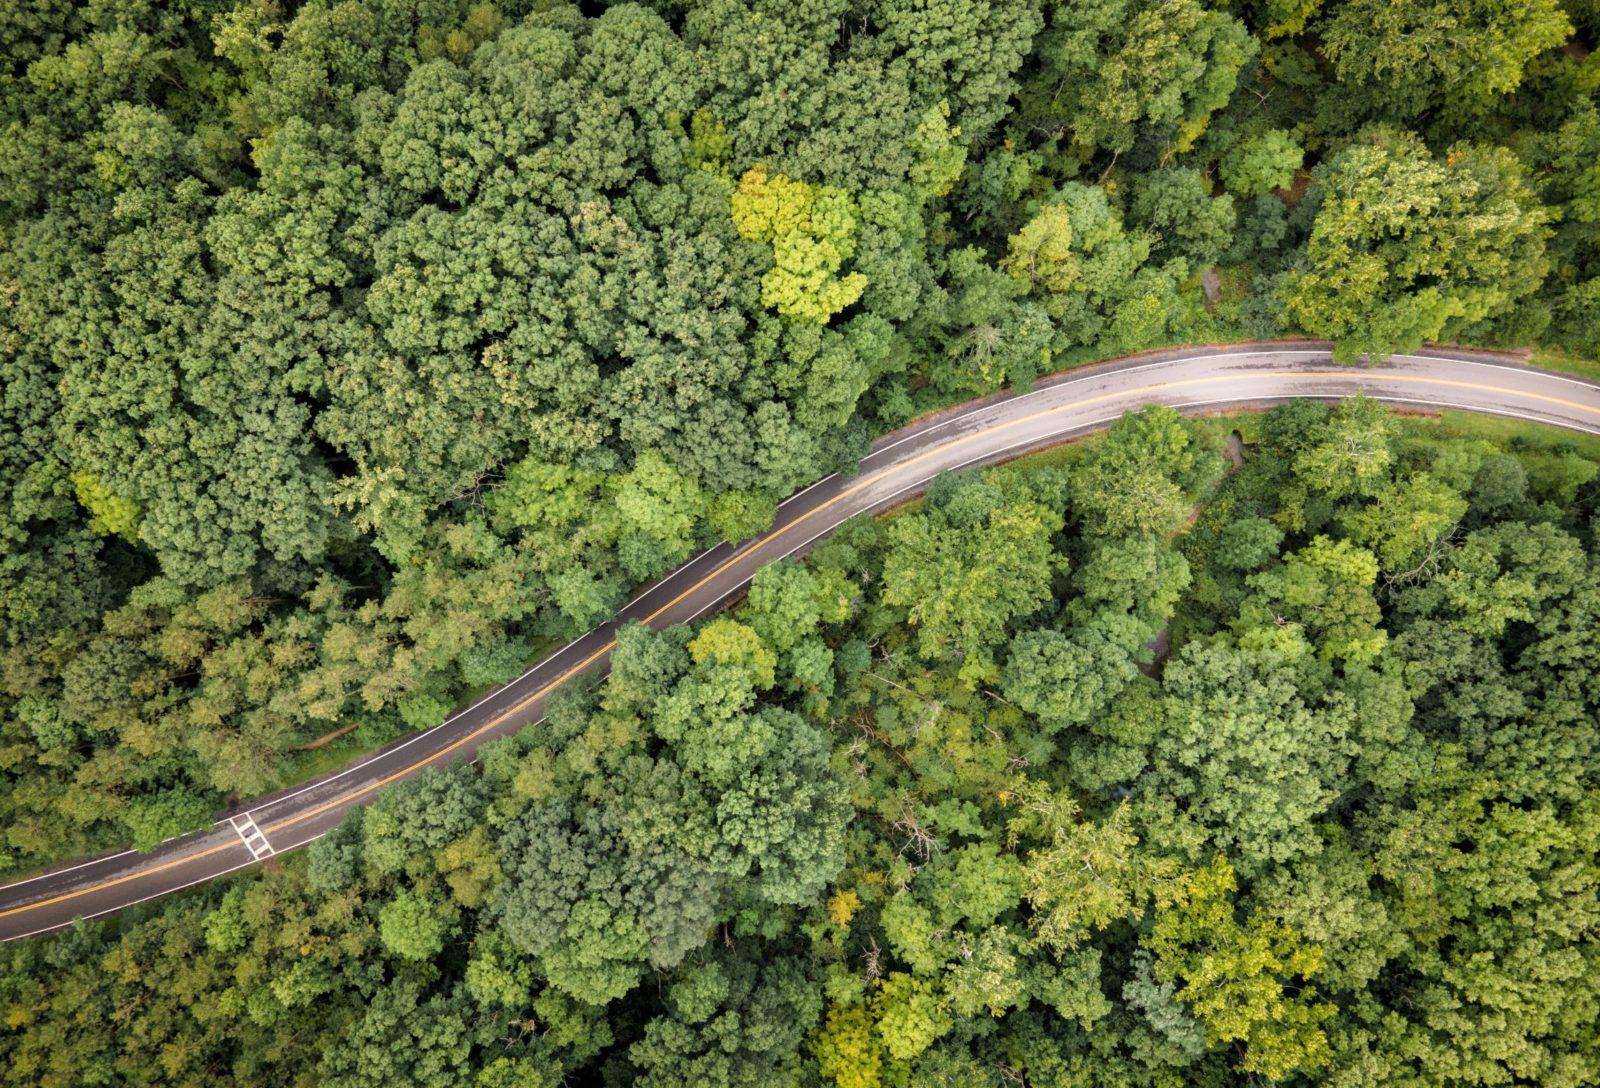 Foresta Verde Attraversata Da Una Strada